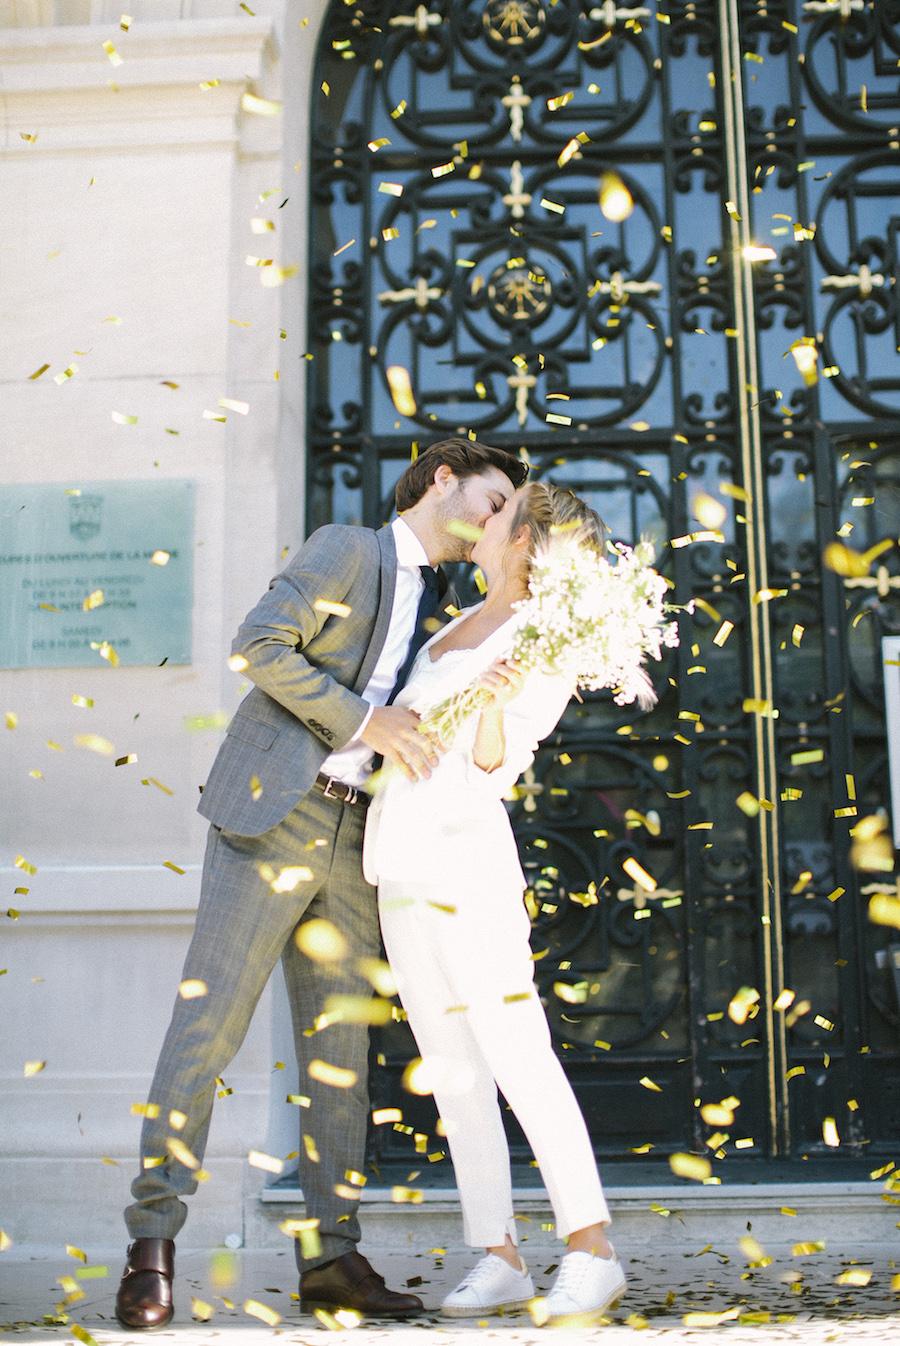 saya-photography-wedding-french-riviera-rustic-antibes-la-bastide-du-roy-15.jpg